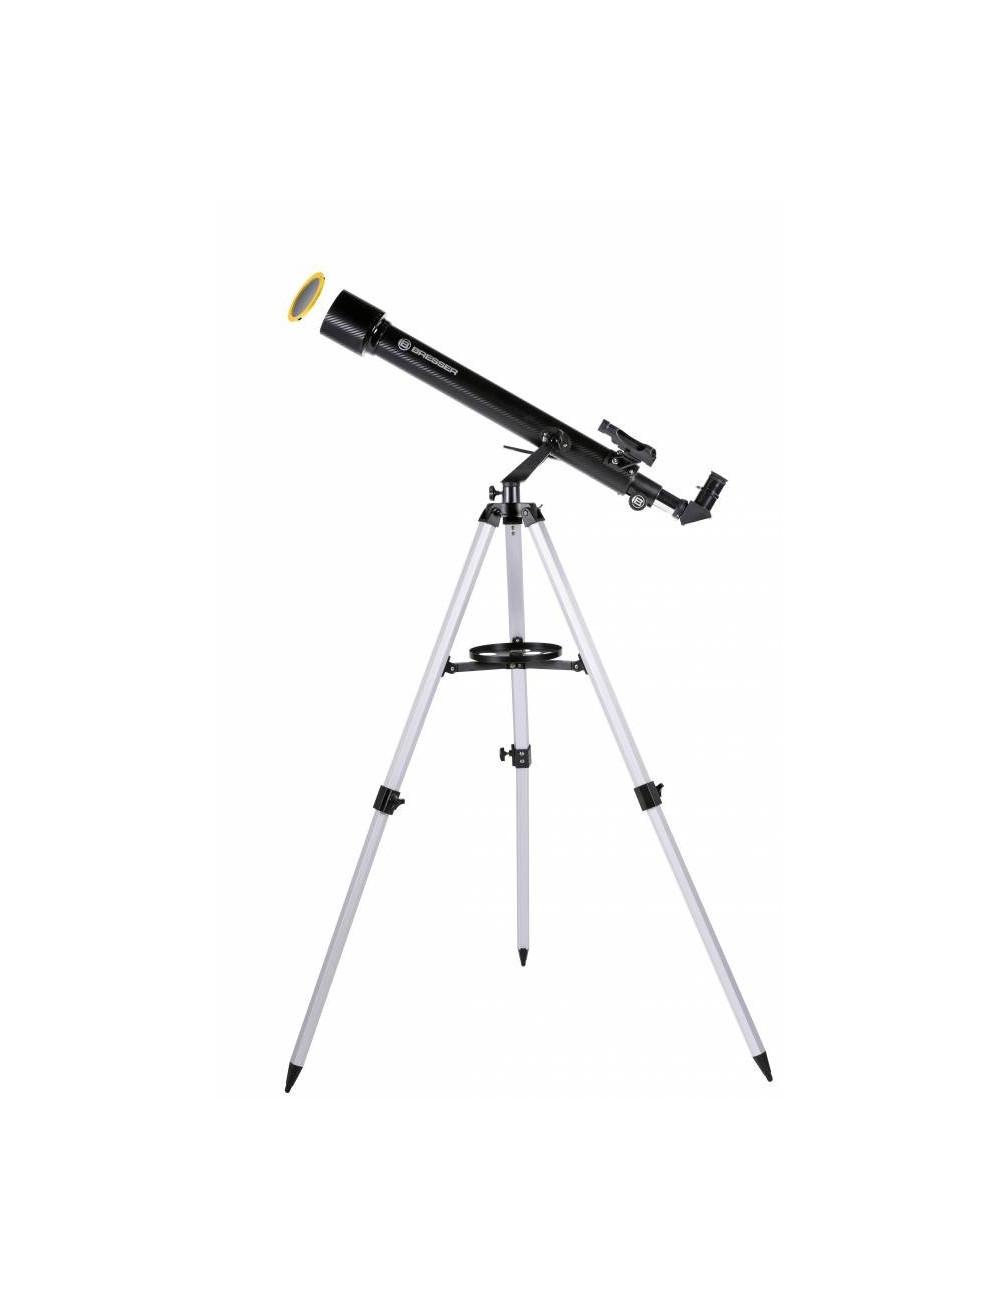 Lunette astronomique Bresser Arcturus 60/700 AT2 Carbon Design